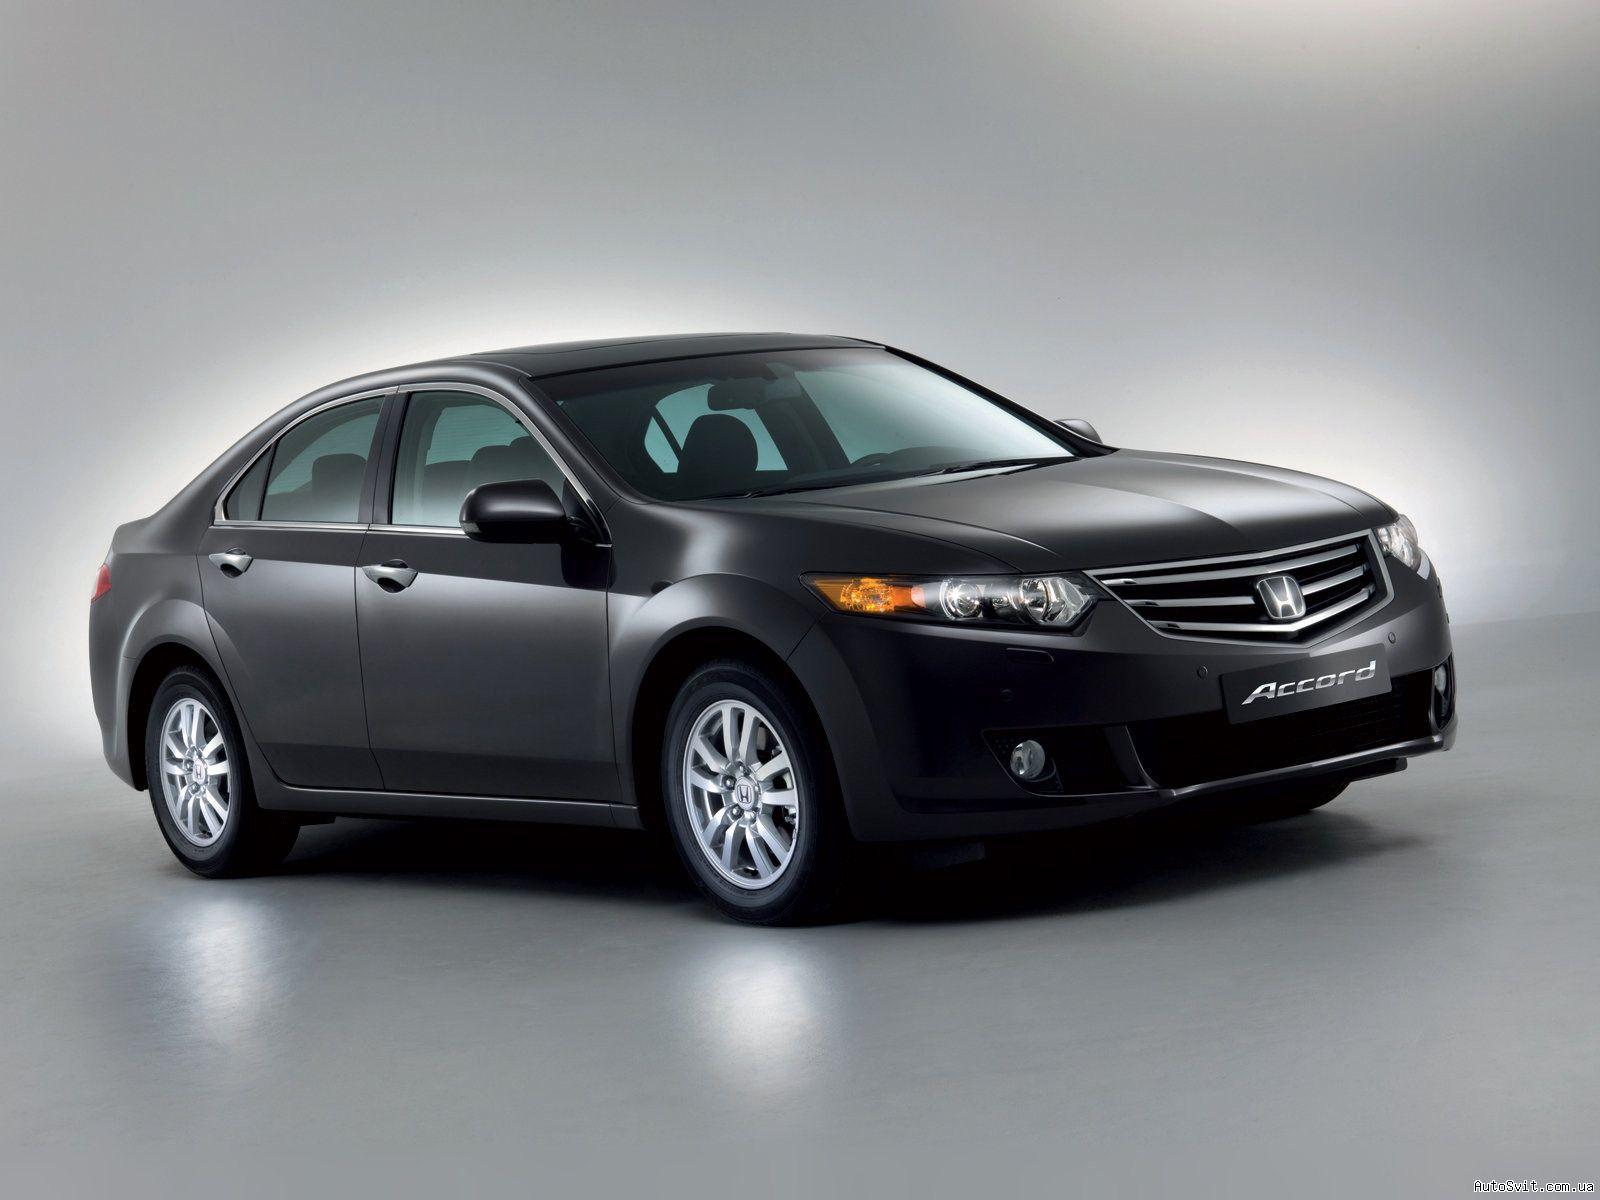 описание, характеристики, Honda Accord, Honda Spirior, Acura TSX, Хонда Аккорд, Хонда Спириор, Акура ТСХ